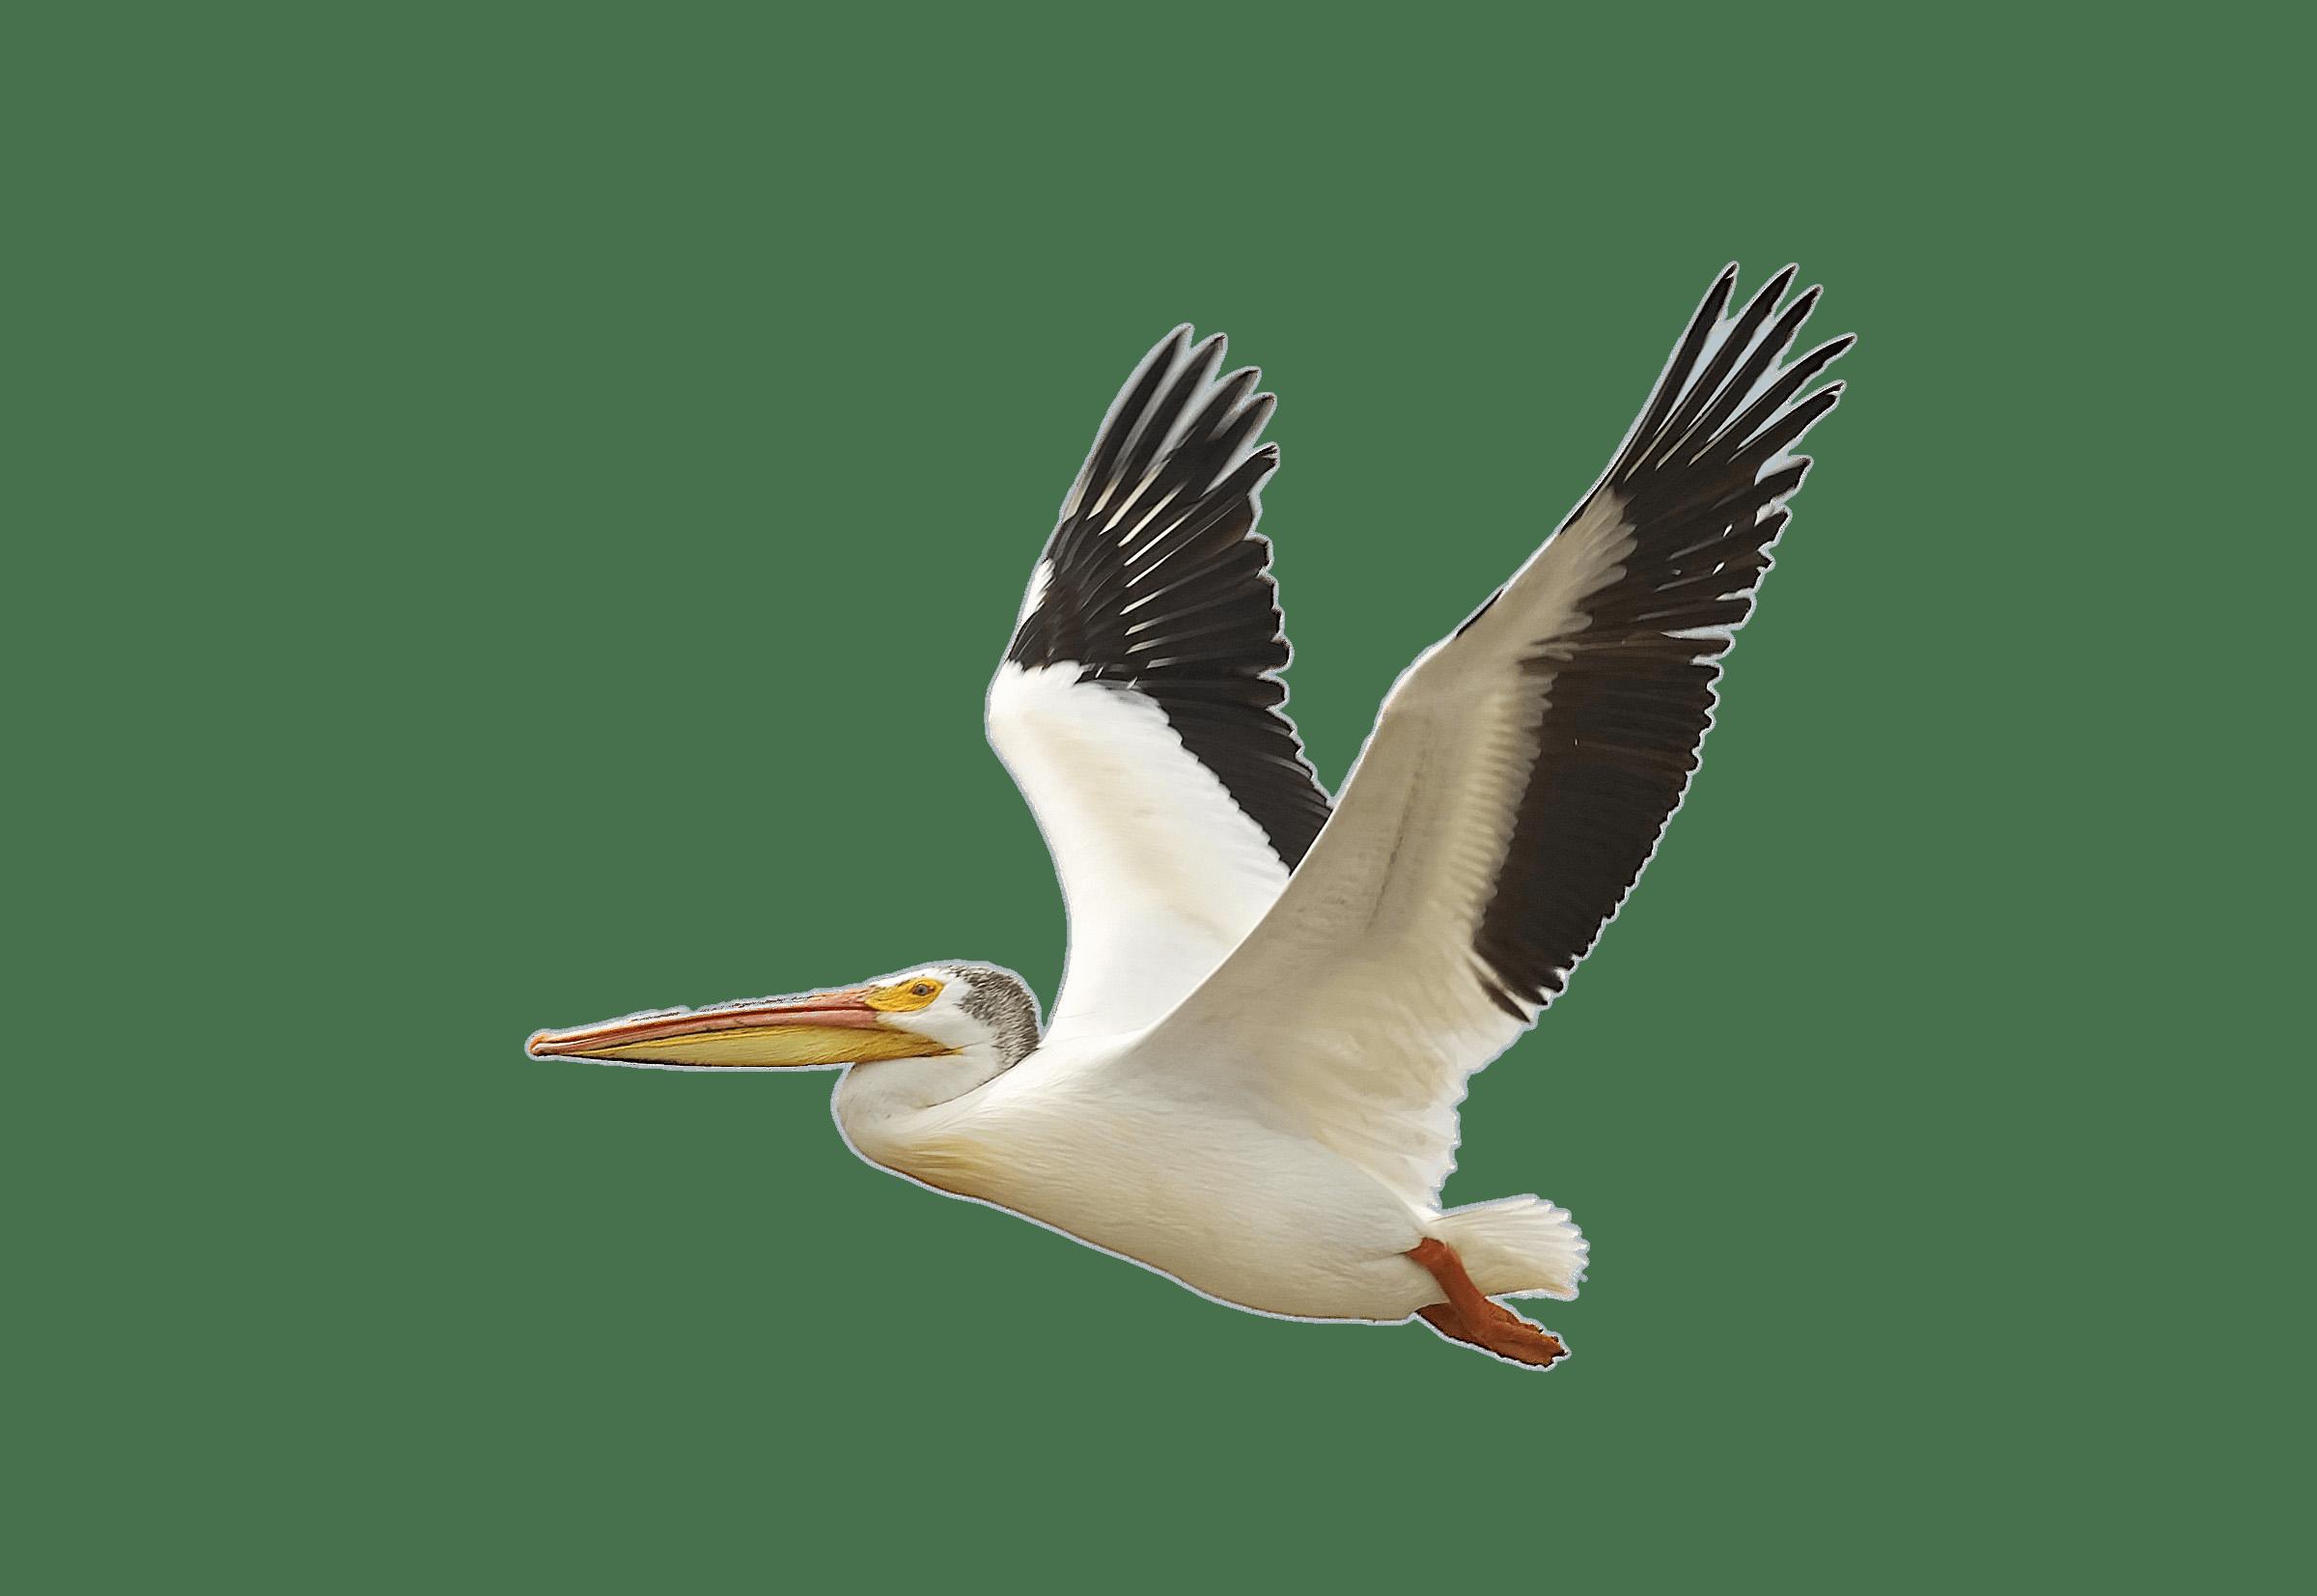 The Birds of America American white pelican Brown pelican.